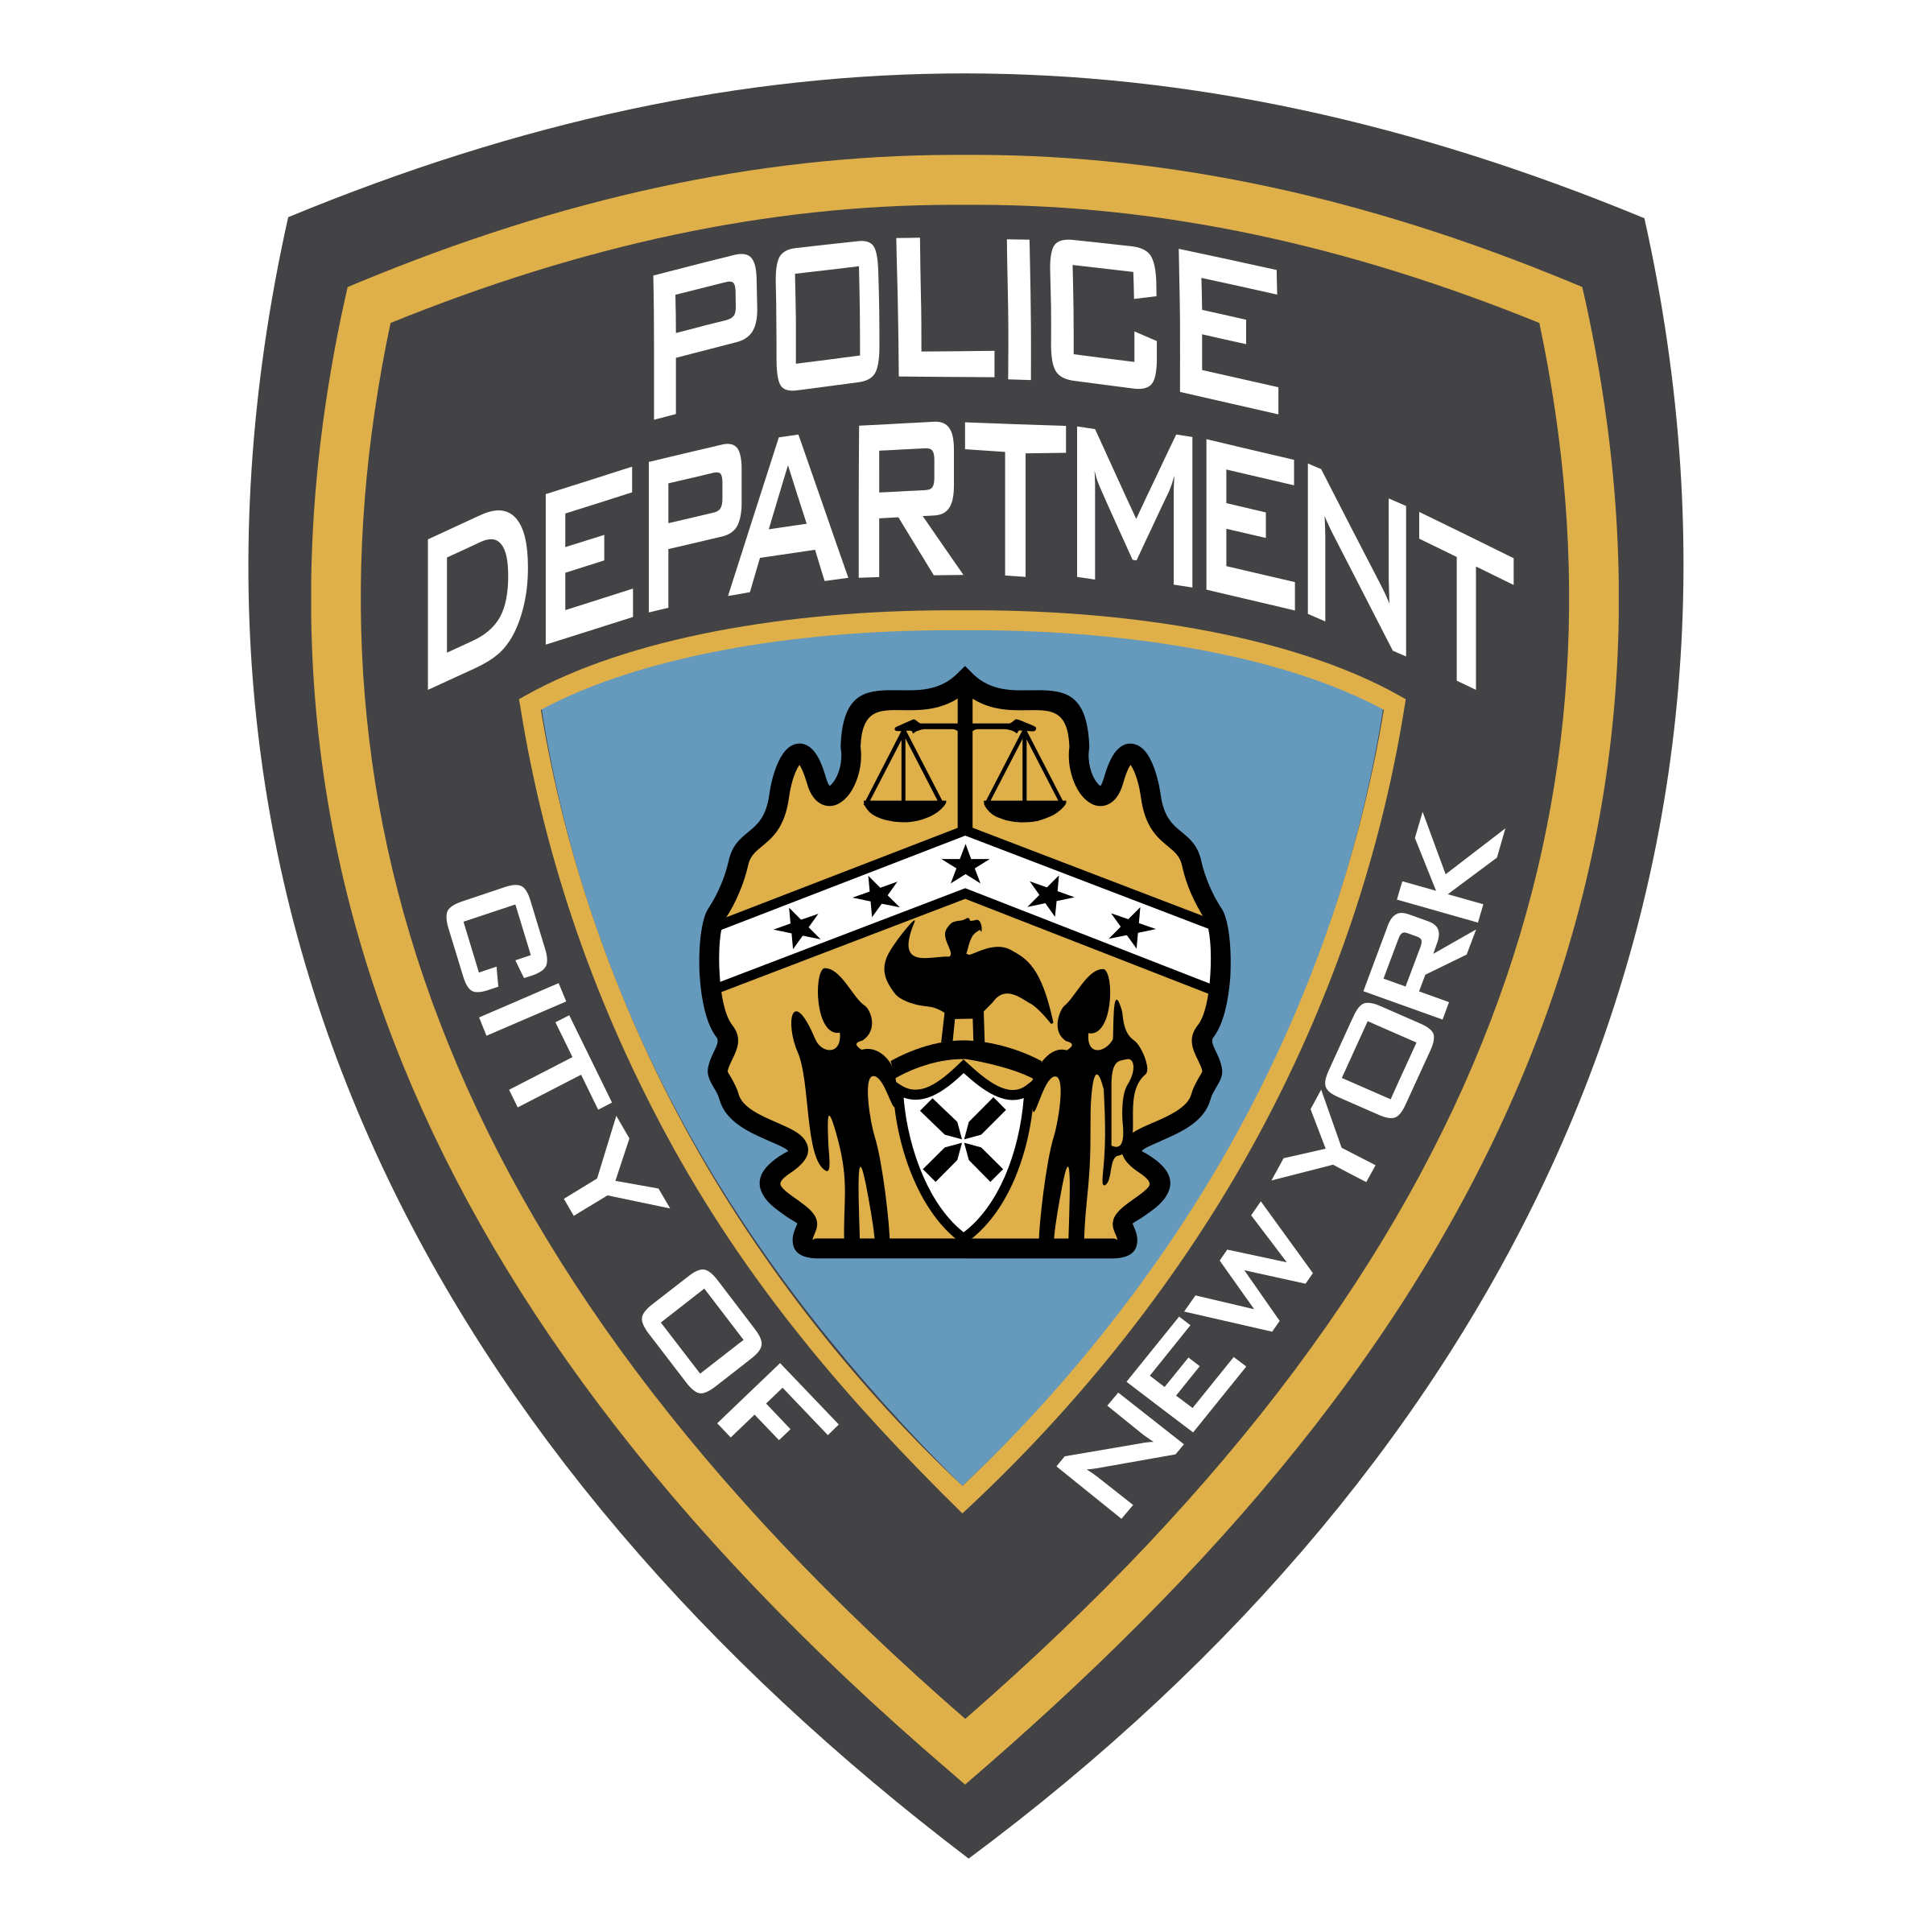 police department logo png transparent svg vector freebie supply rh freebiesupply com police logo images police logo creator